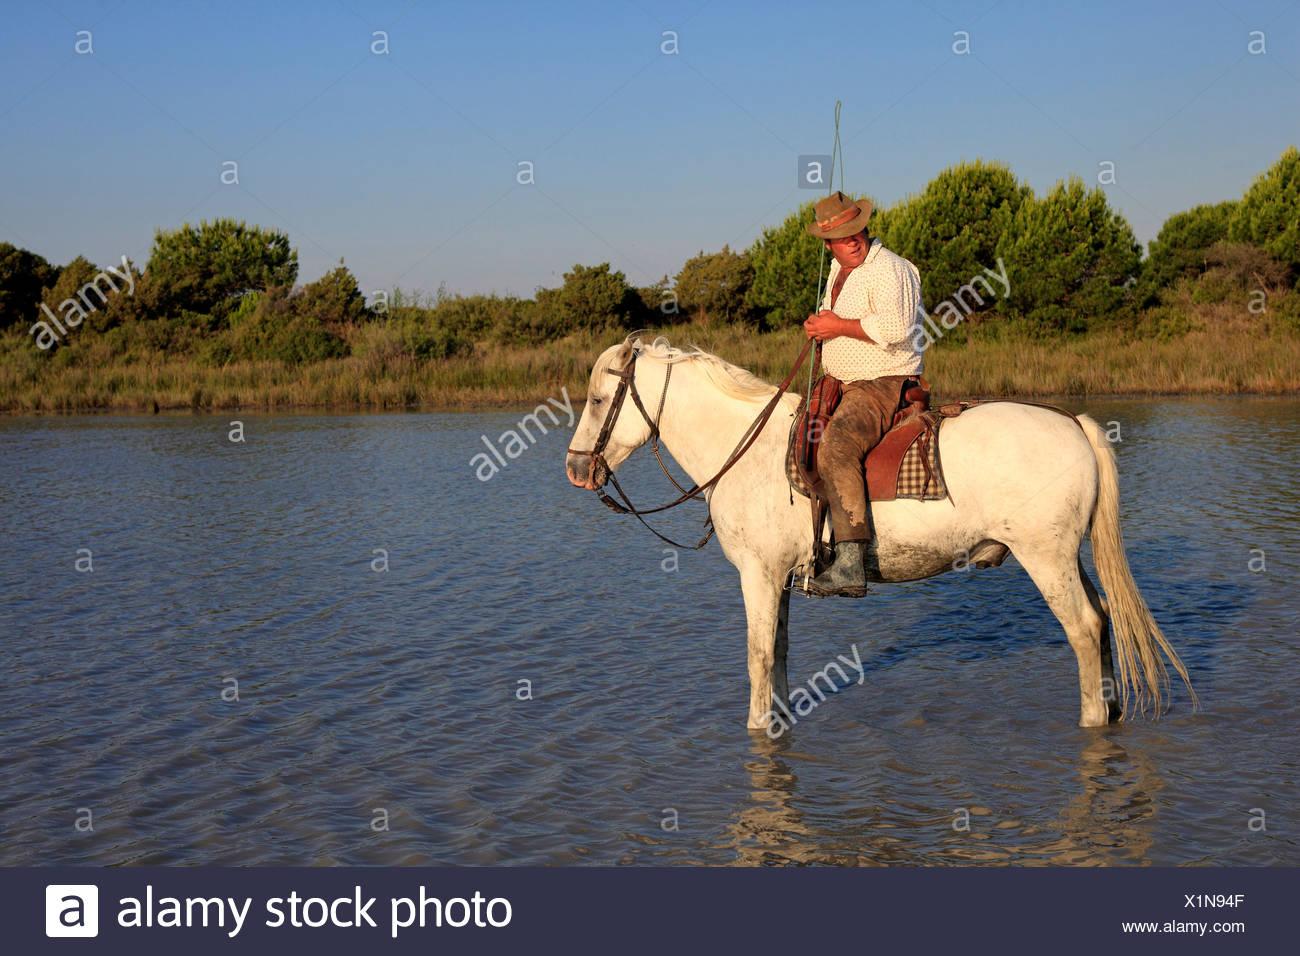 Man riding a Camargue Horse (Equus caballus) in water, Saintes-Marie-de-la-Mer, Camargue, France, Europe - Stock Image